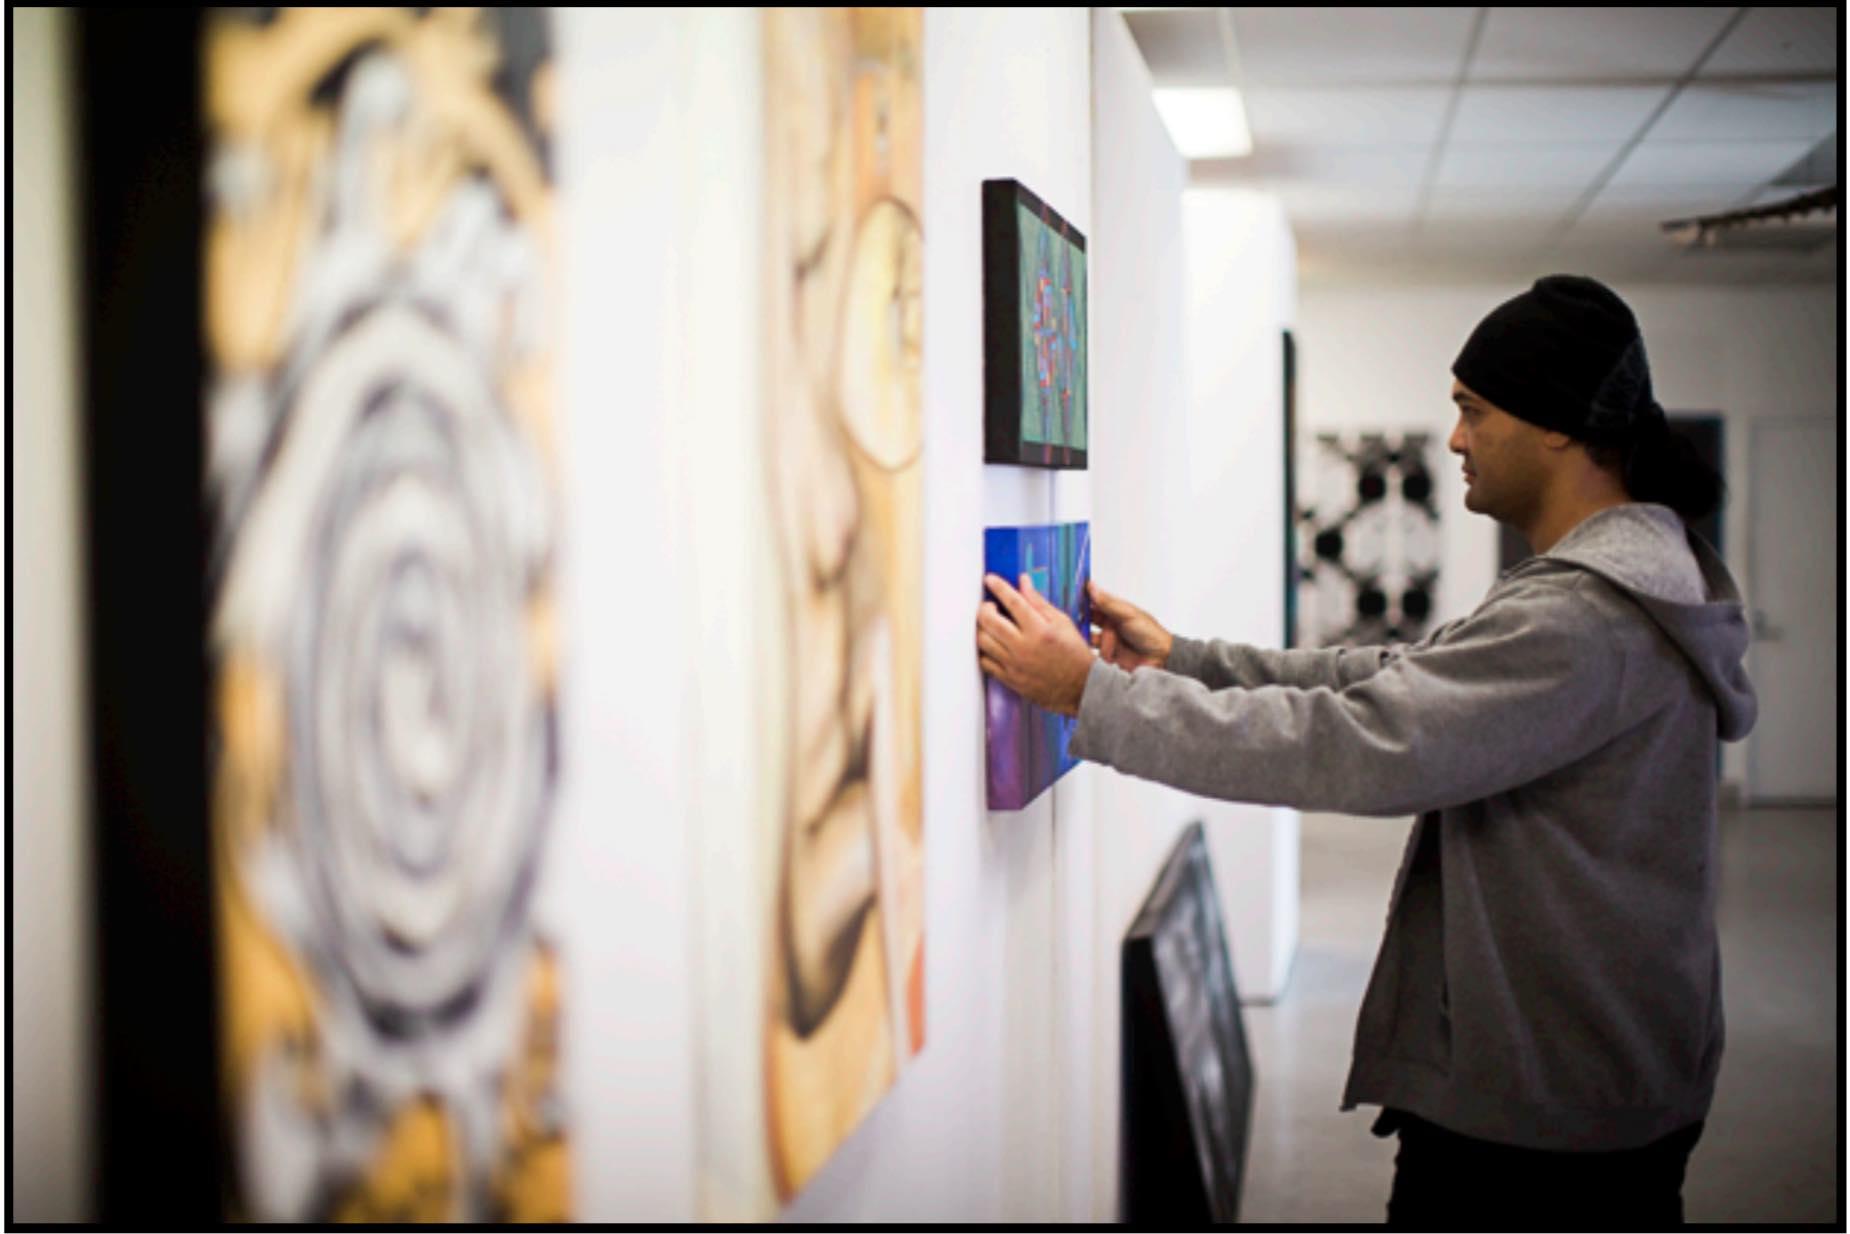 buy maori art modern online gallery shop te rahui nicholls